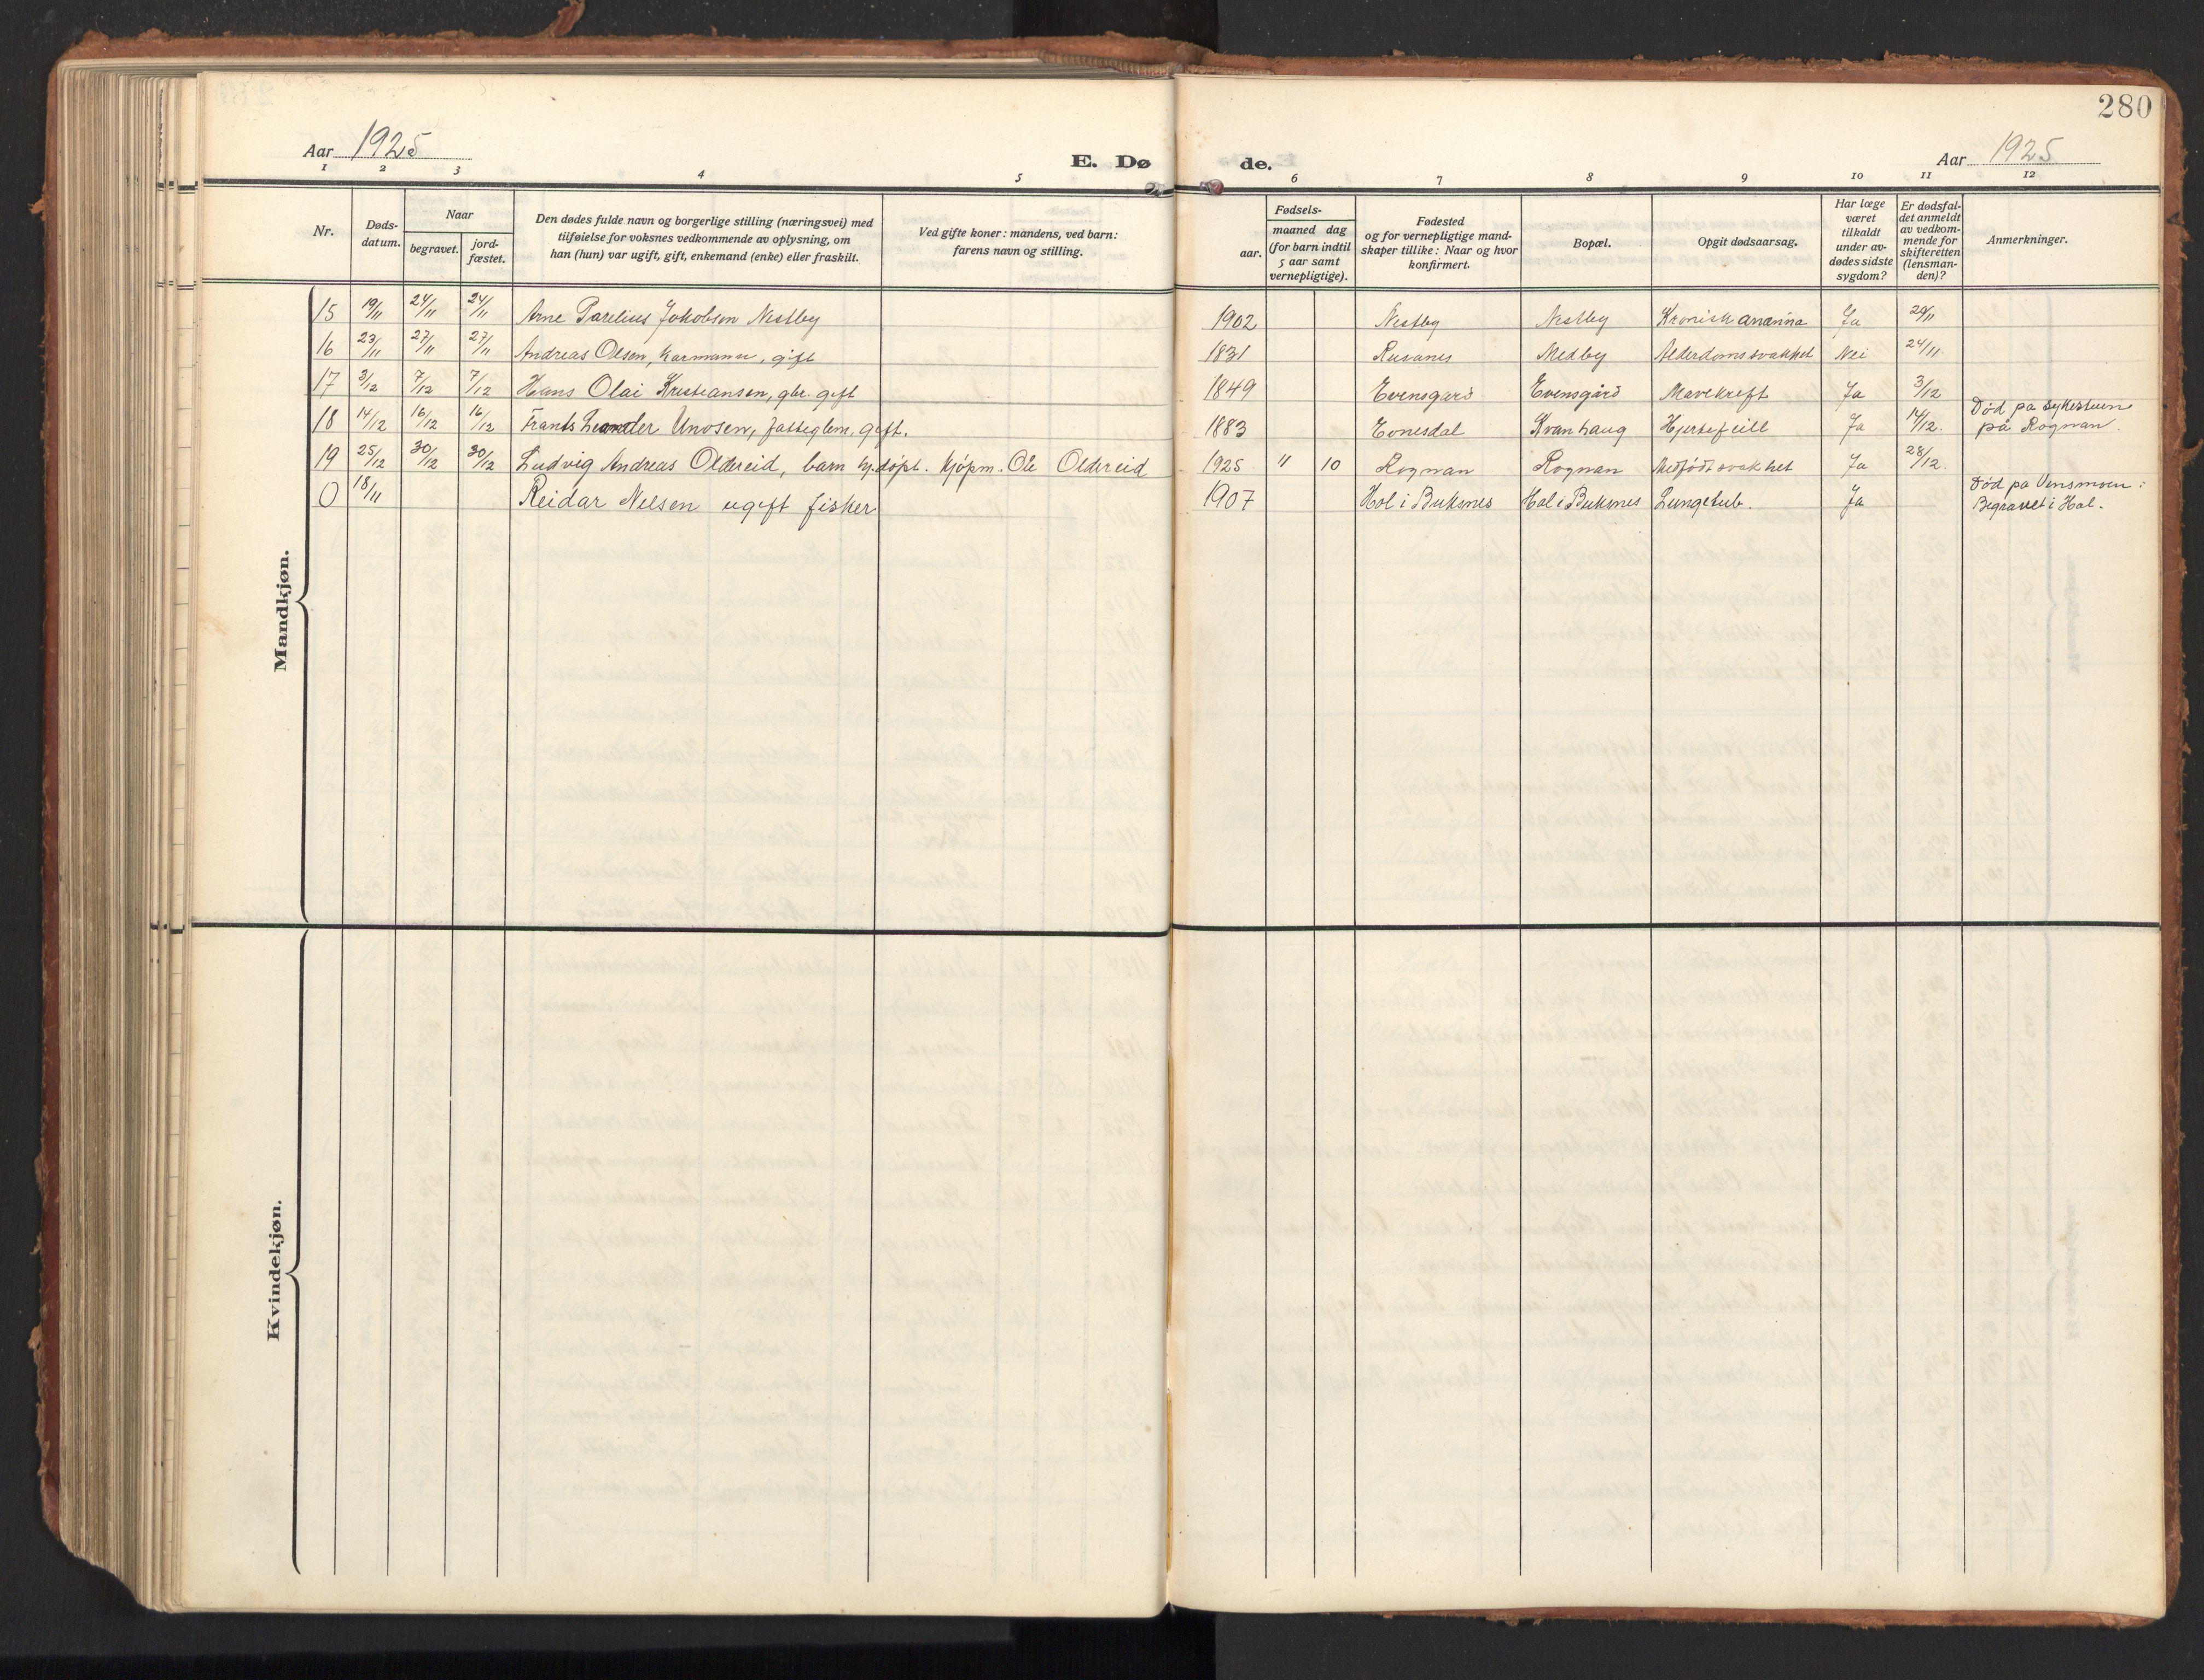 SAT, Ministerialprotokoller, klokkerbøker og fødselsregistre - Nordland, 847/L0683: Klokkerbok nr. 847C11, 1908-1929, s. 280